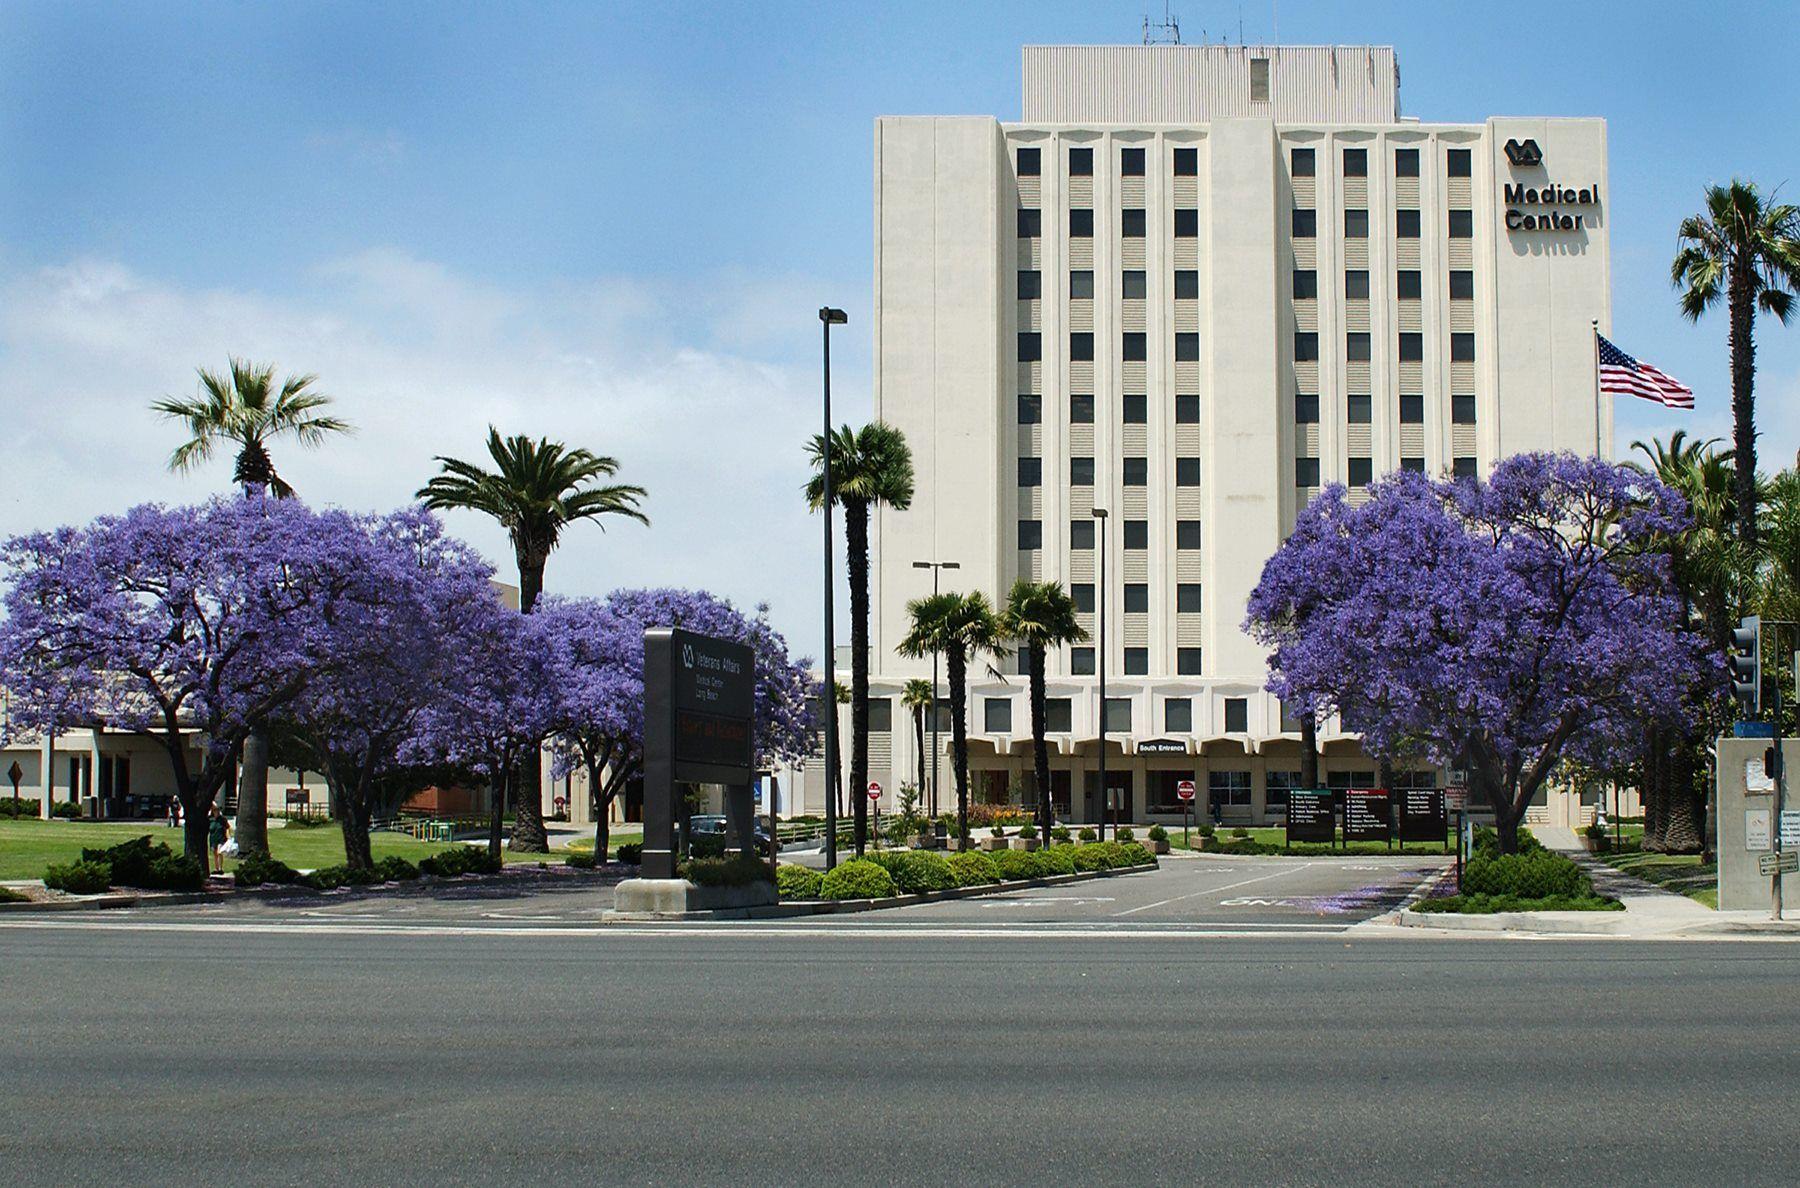 Long beach veterans hospital google search va hospital